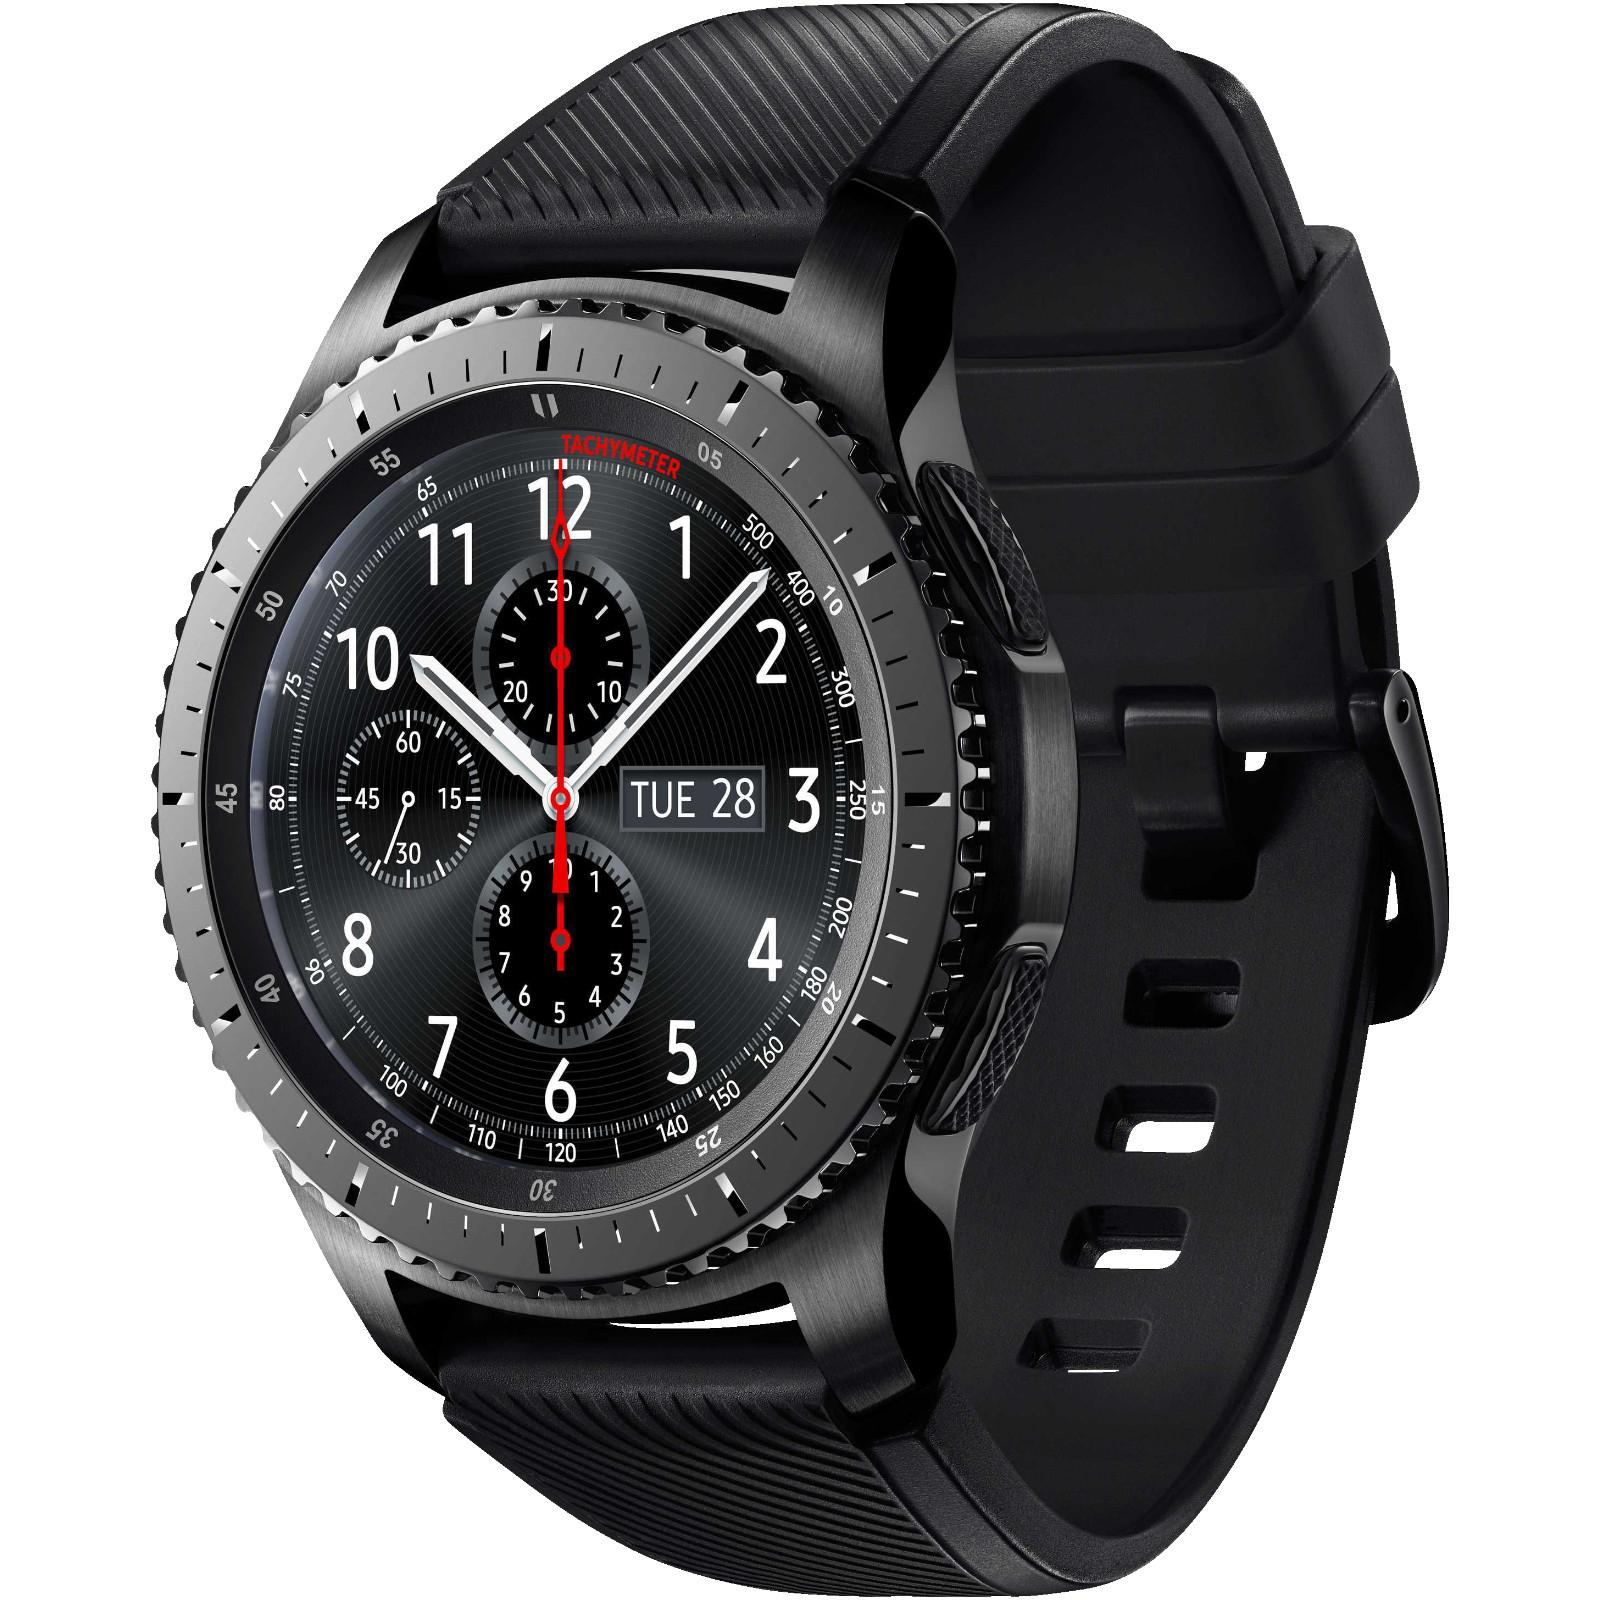 [Saturn/ebay] SAMSUNG Gear S3 Frontier & Classic, Smartwatch